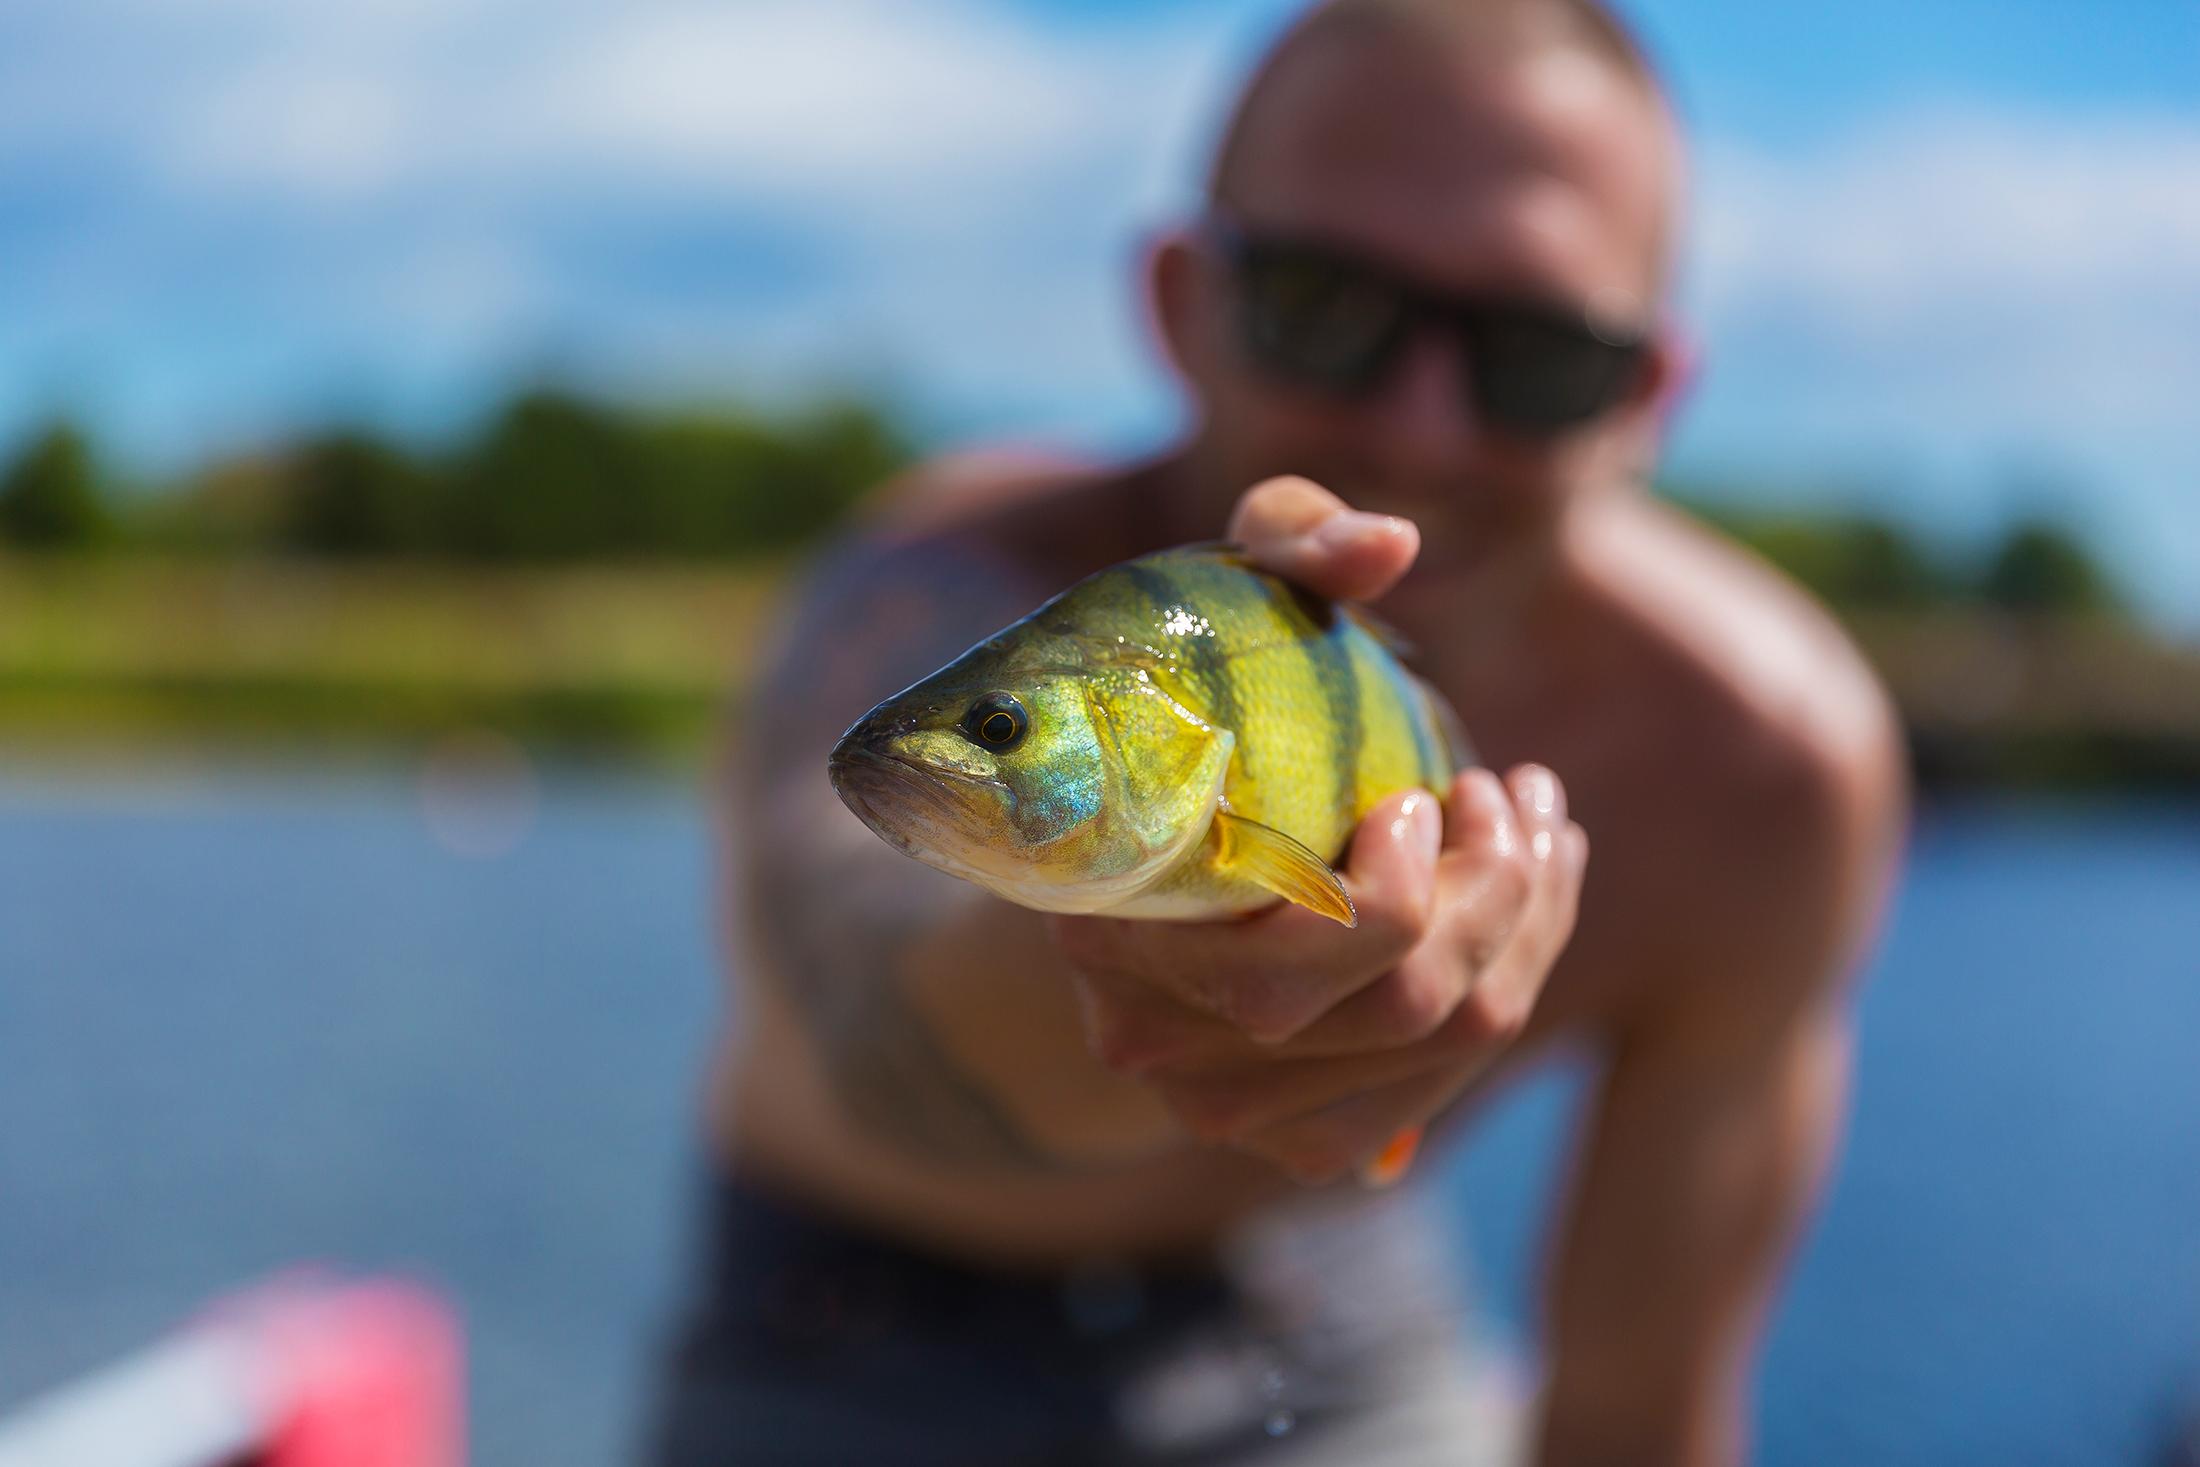 Lucasflyfishing-MG_9269.jpg